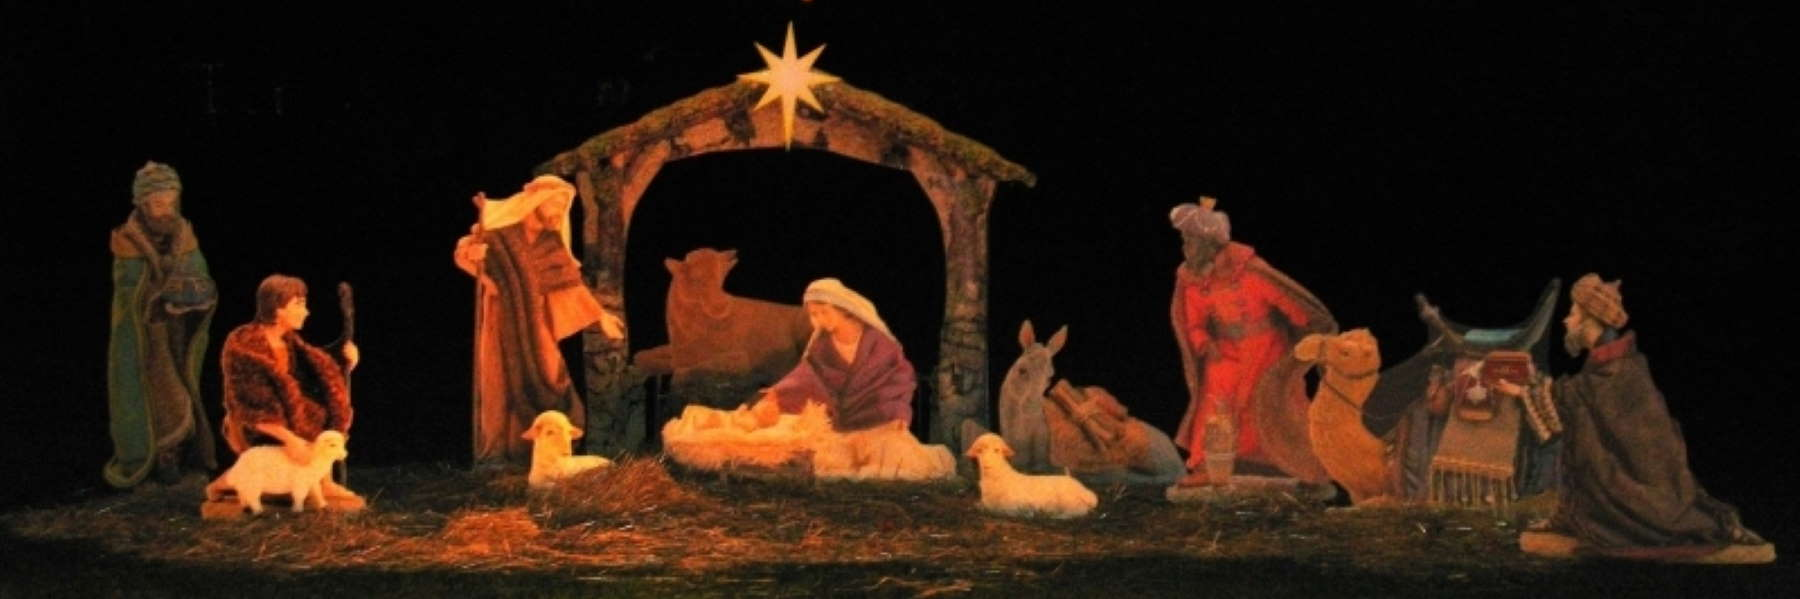 Nativity1800x600